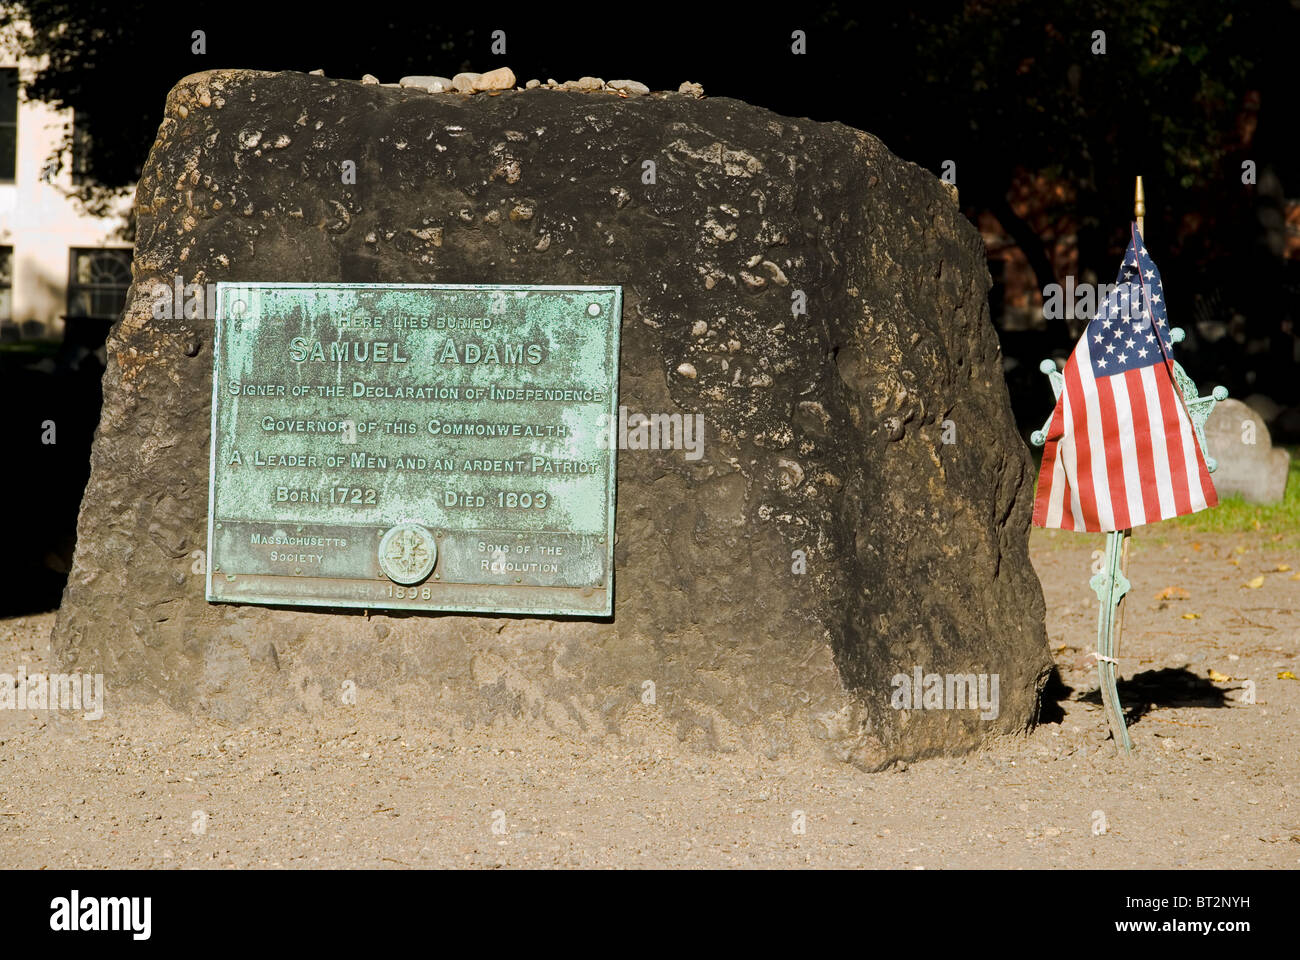 Grave of Samuel Adams, signer of the declaration of independence. Granary Burying Ground, Boston, Massachusetts, - Stock Image